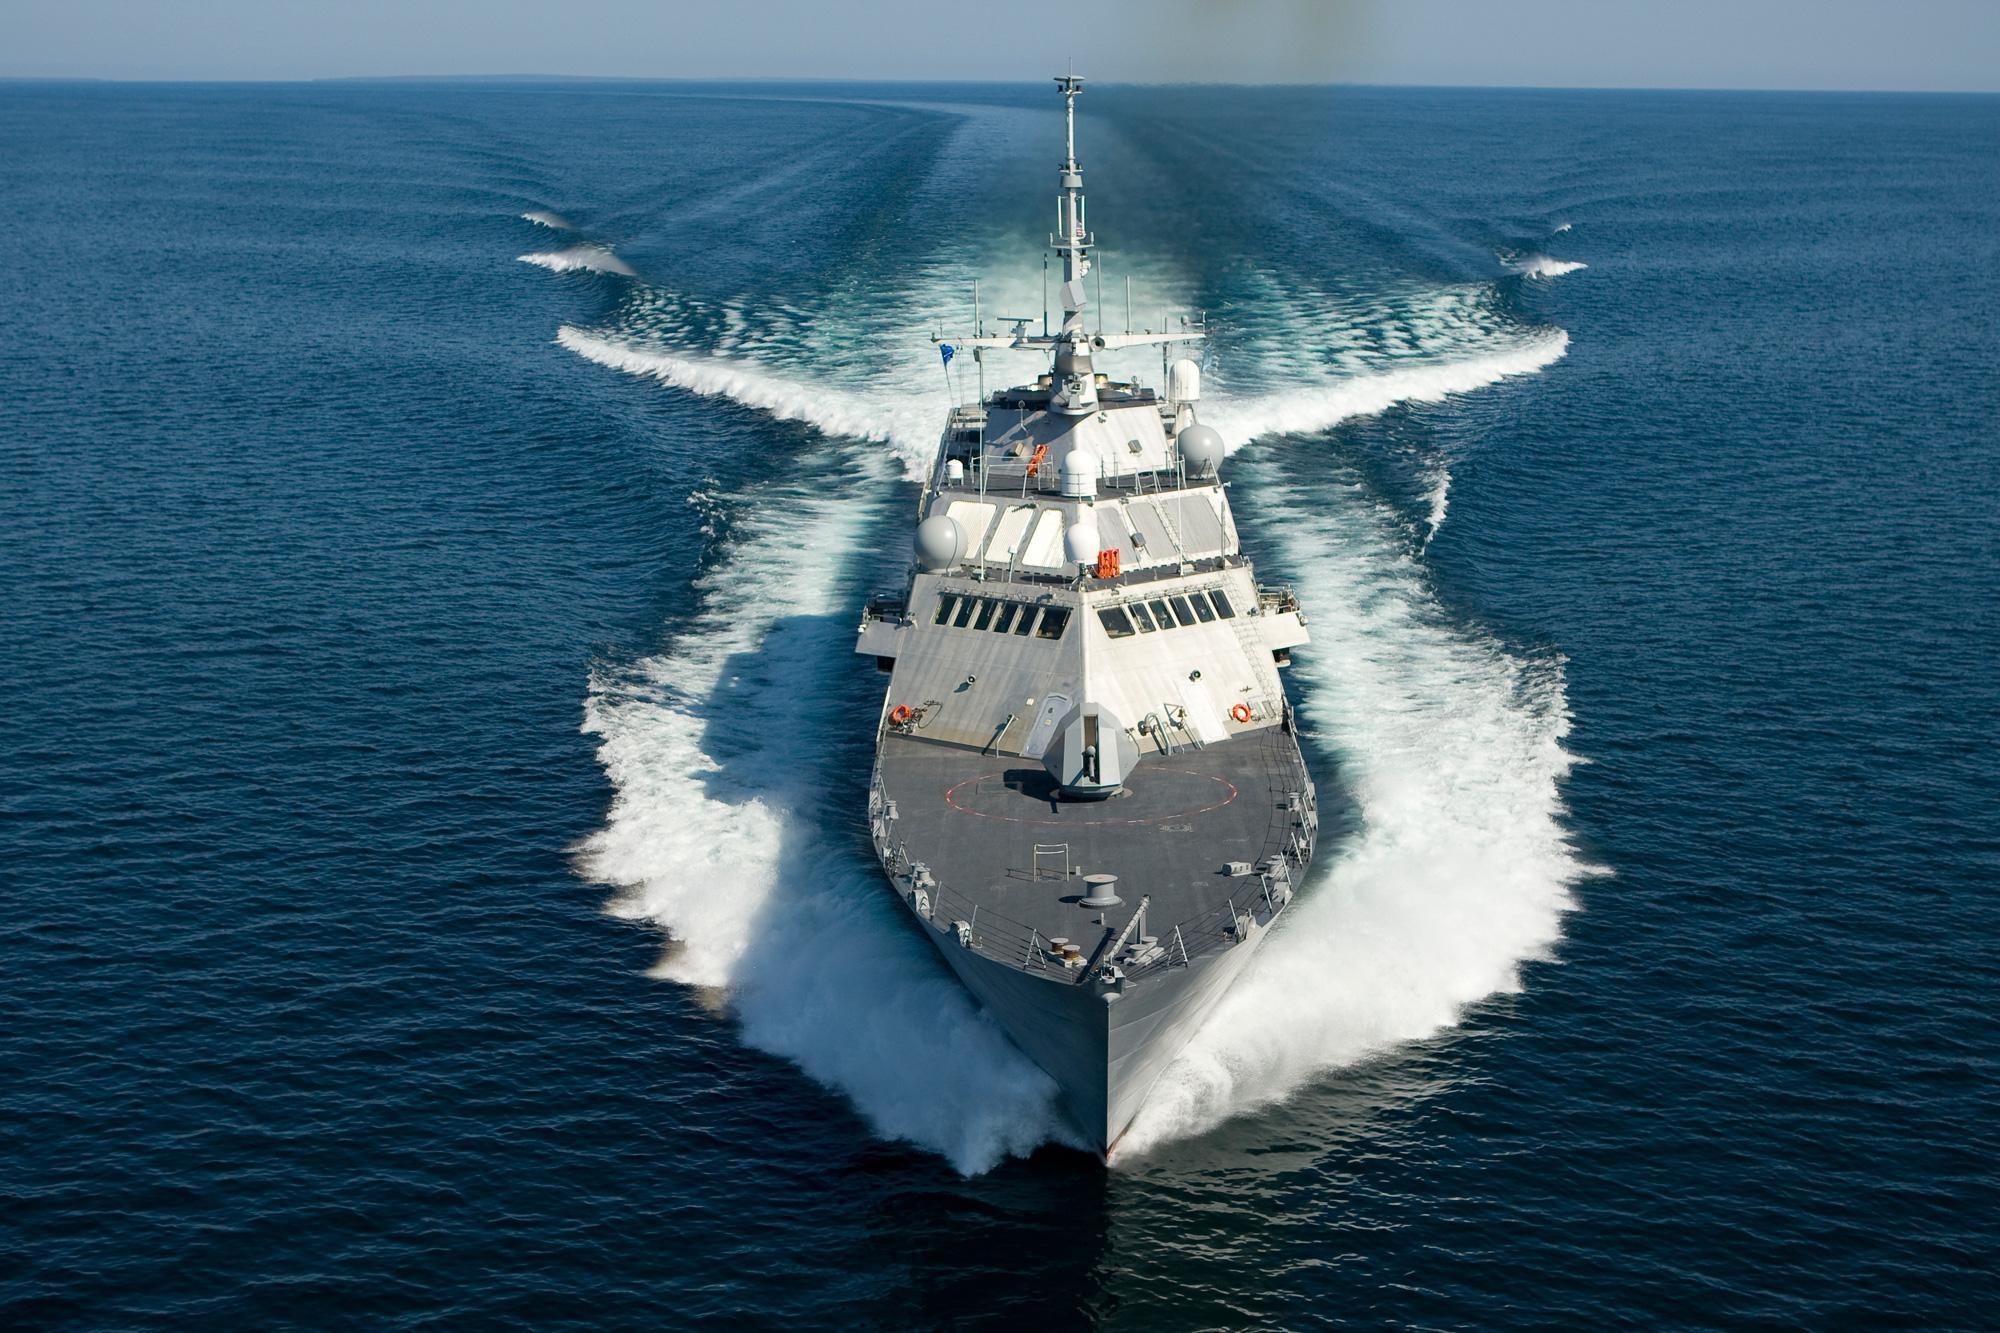 HD US Navy Ship Wallpaper HD Full Size – HiReWallpapers 10493